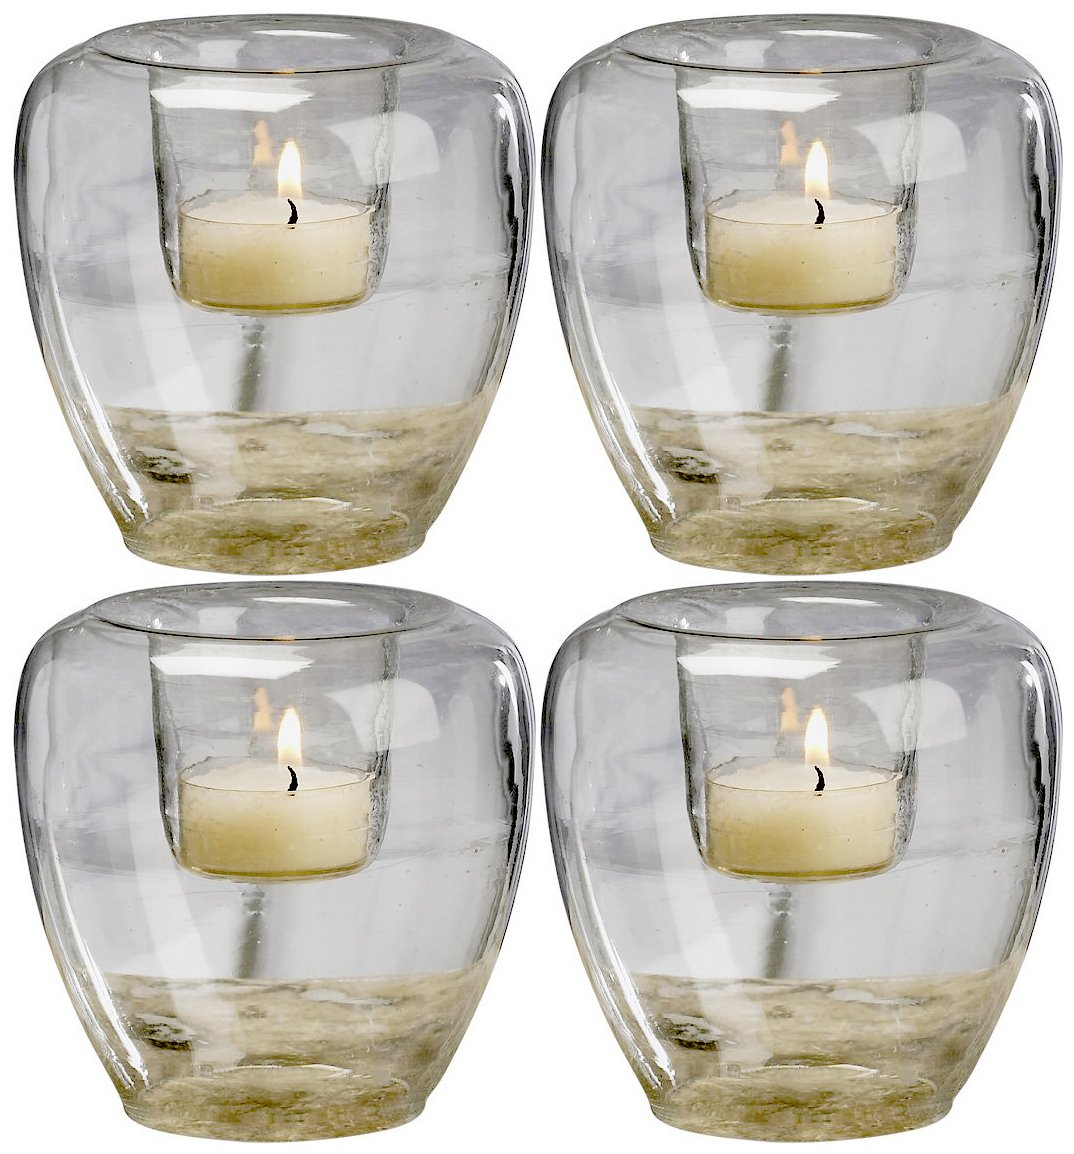 Biedermann & Sons Add Your Own Theme Bubble Glass Votive Candle Holders, Set of 4 Biedrmann & Sons HJ643C